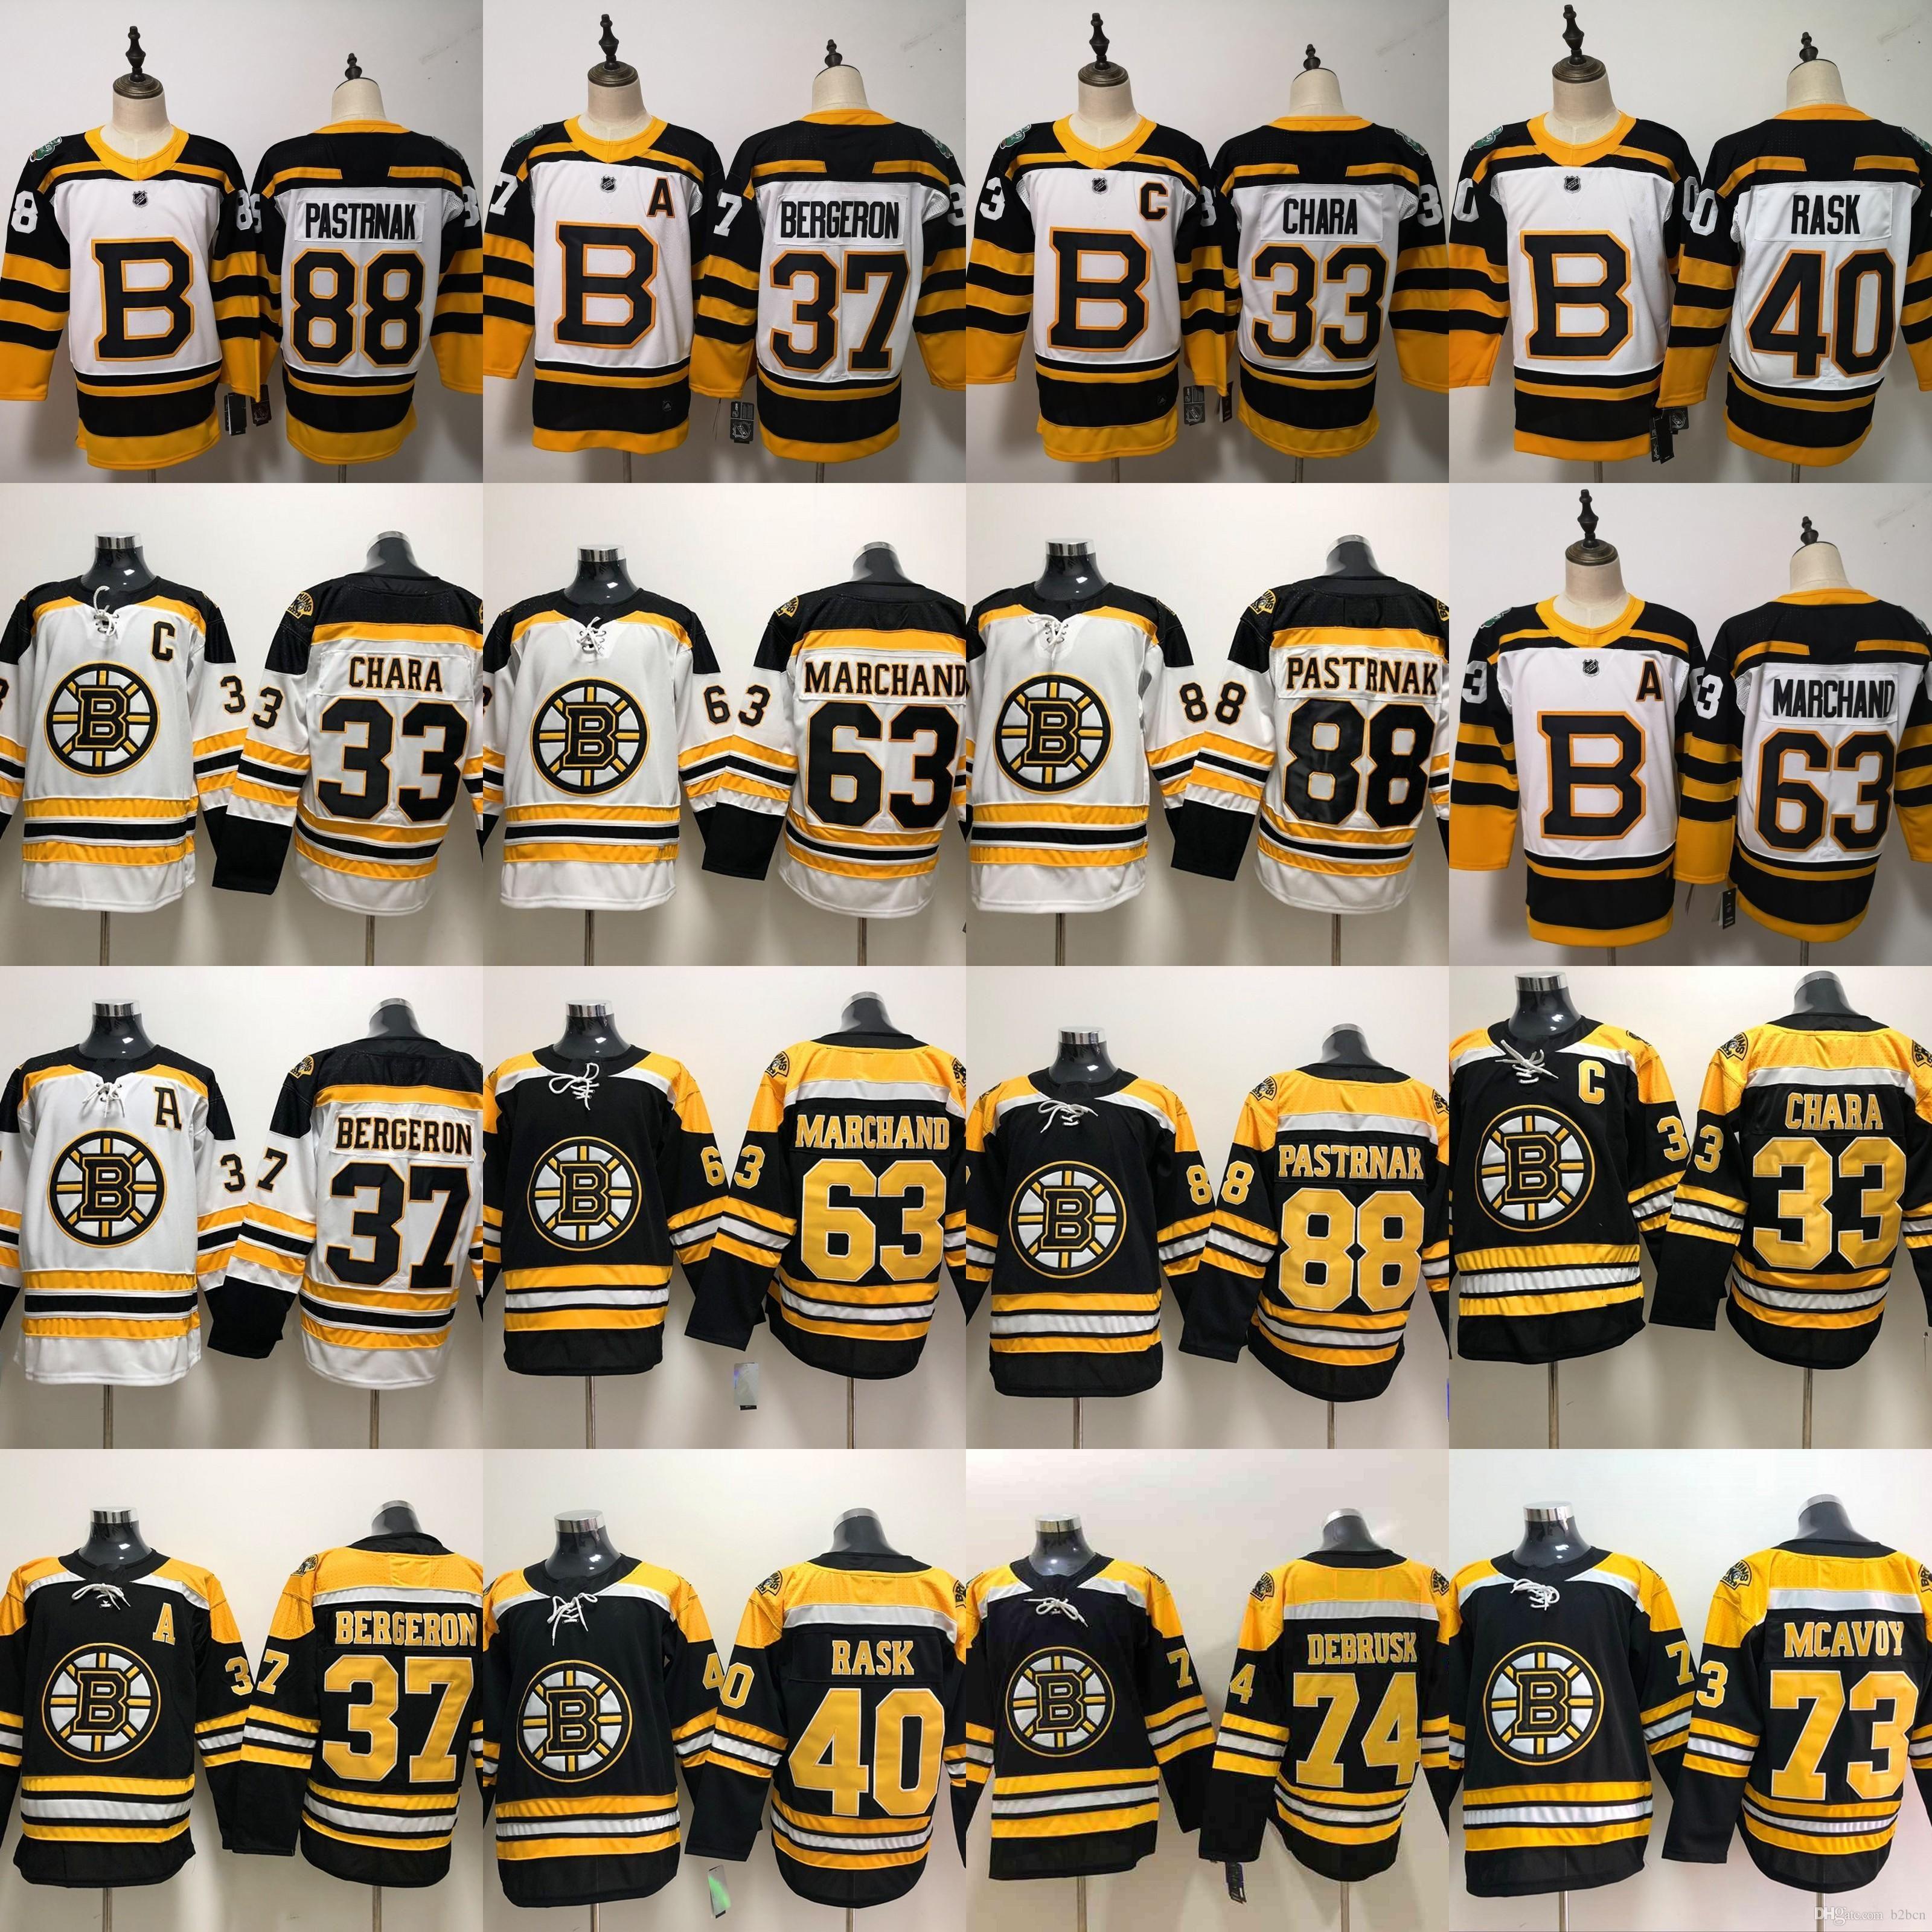 quality design f4a88 07663 Boston Bruins Charlie Mcavoy hockey Jersey Jake DeBrusk Zdeno Chara Patrice  Brad Marchand Cam Neely David Pastrnak Winter Classic uniform